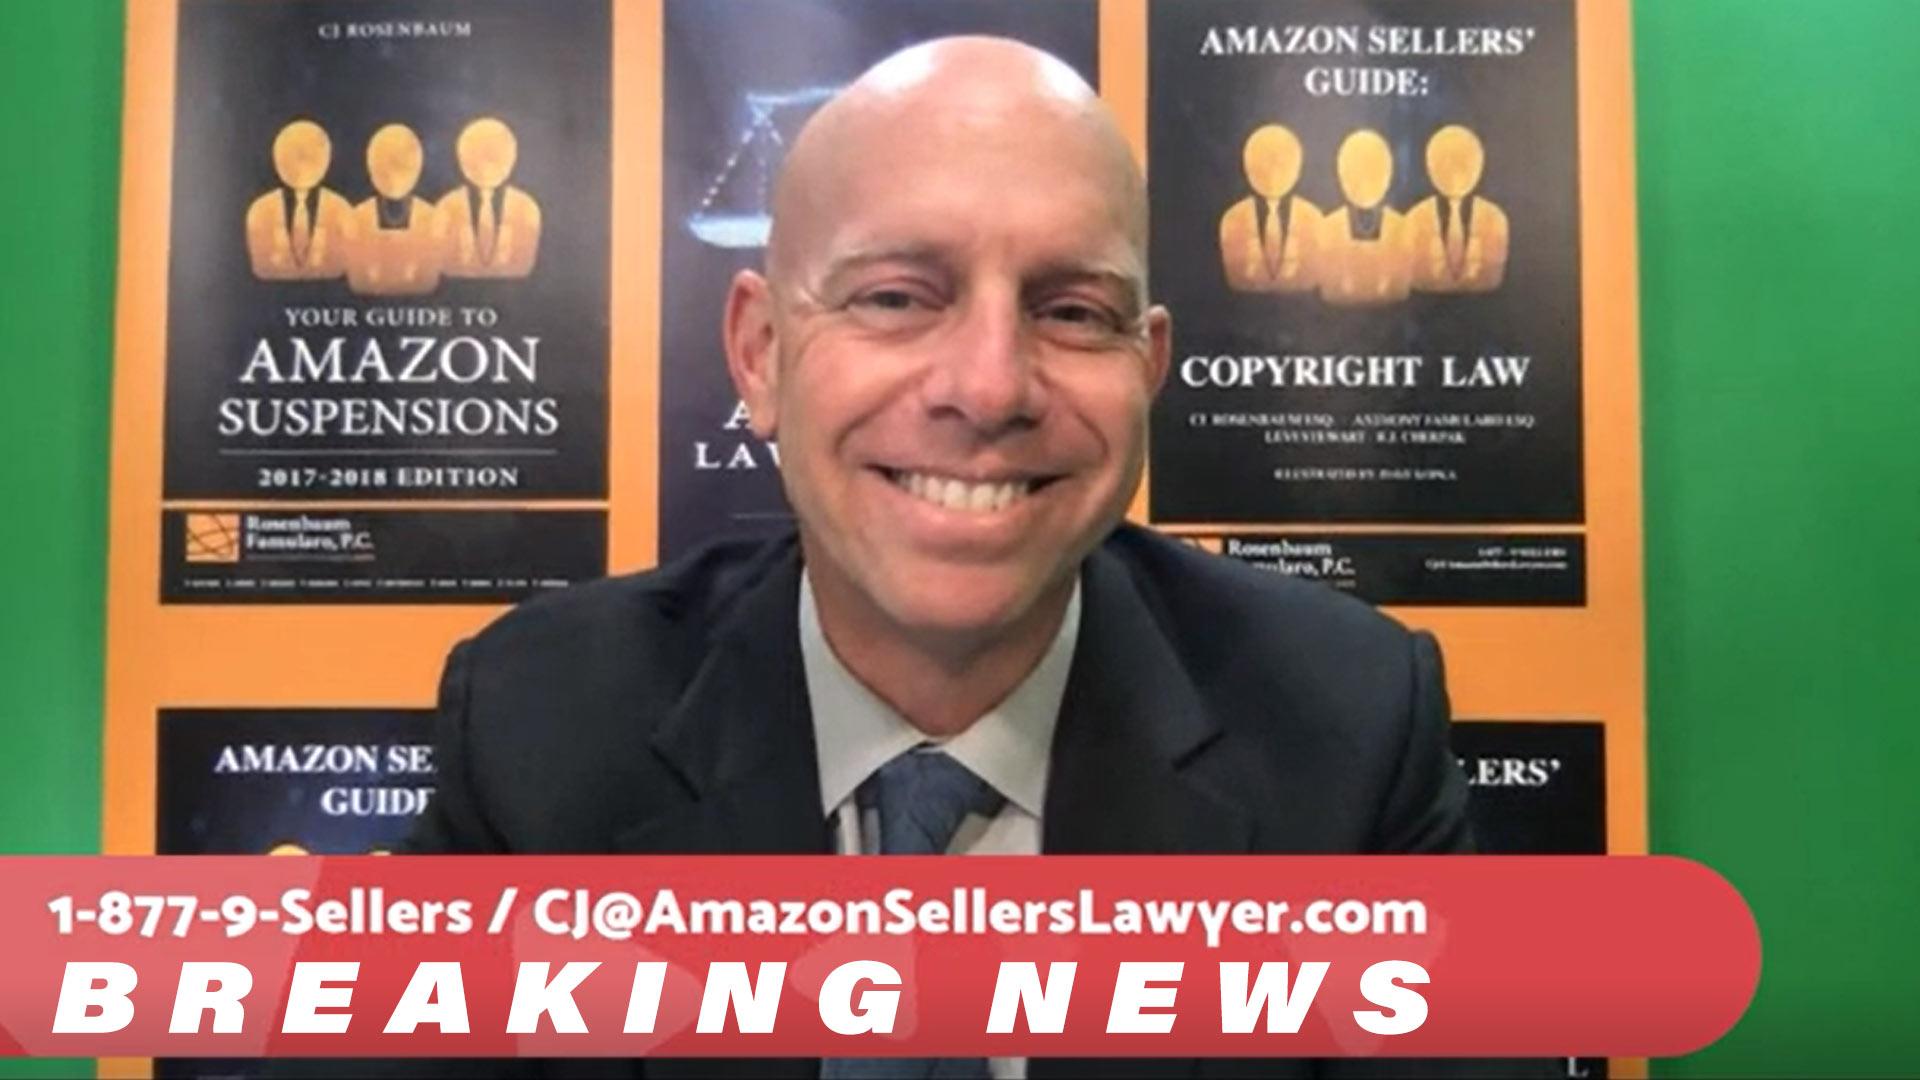 Amazon sellers breaking news